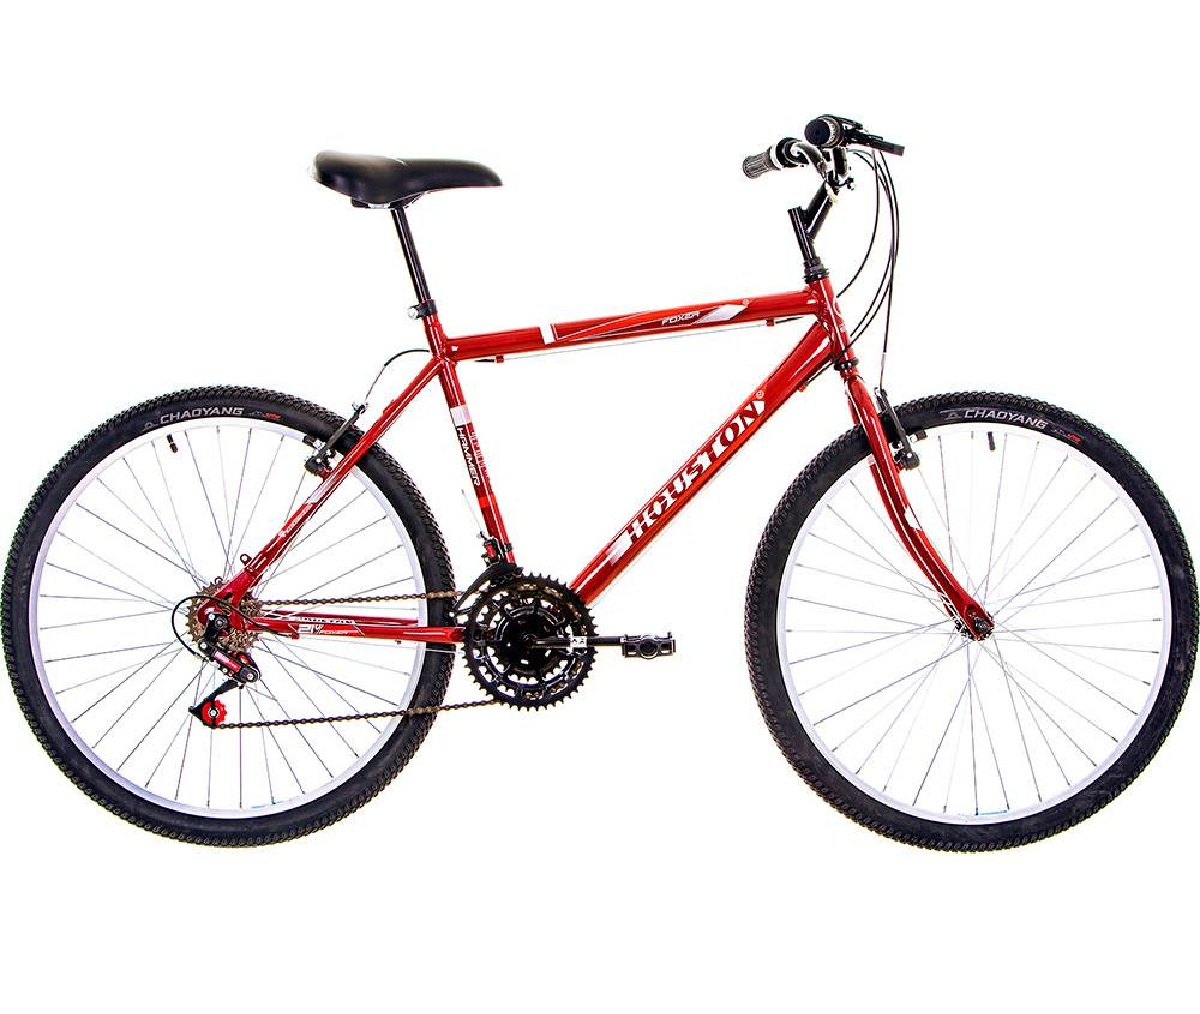 Bicicleta Foxer Hammer Aro 26 21 Marchas Vermelha - Houston